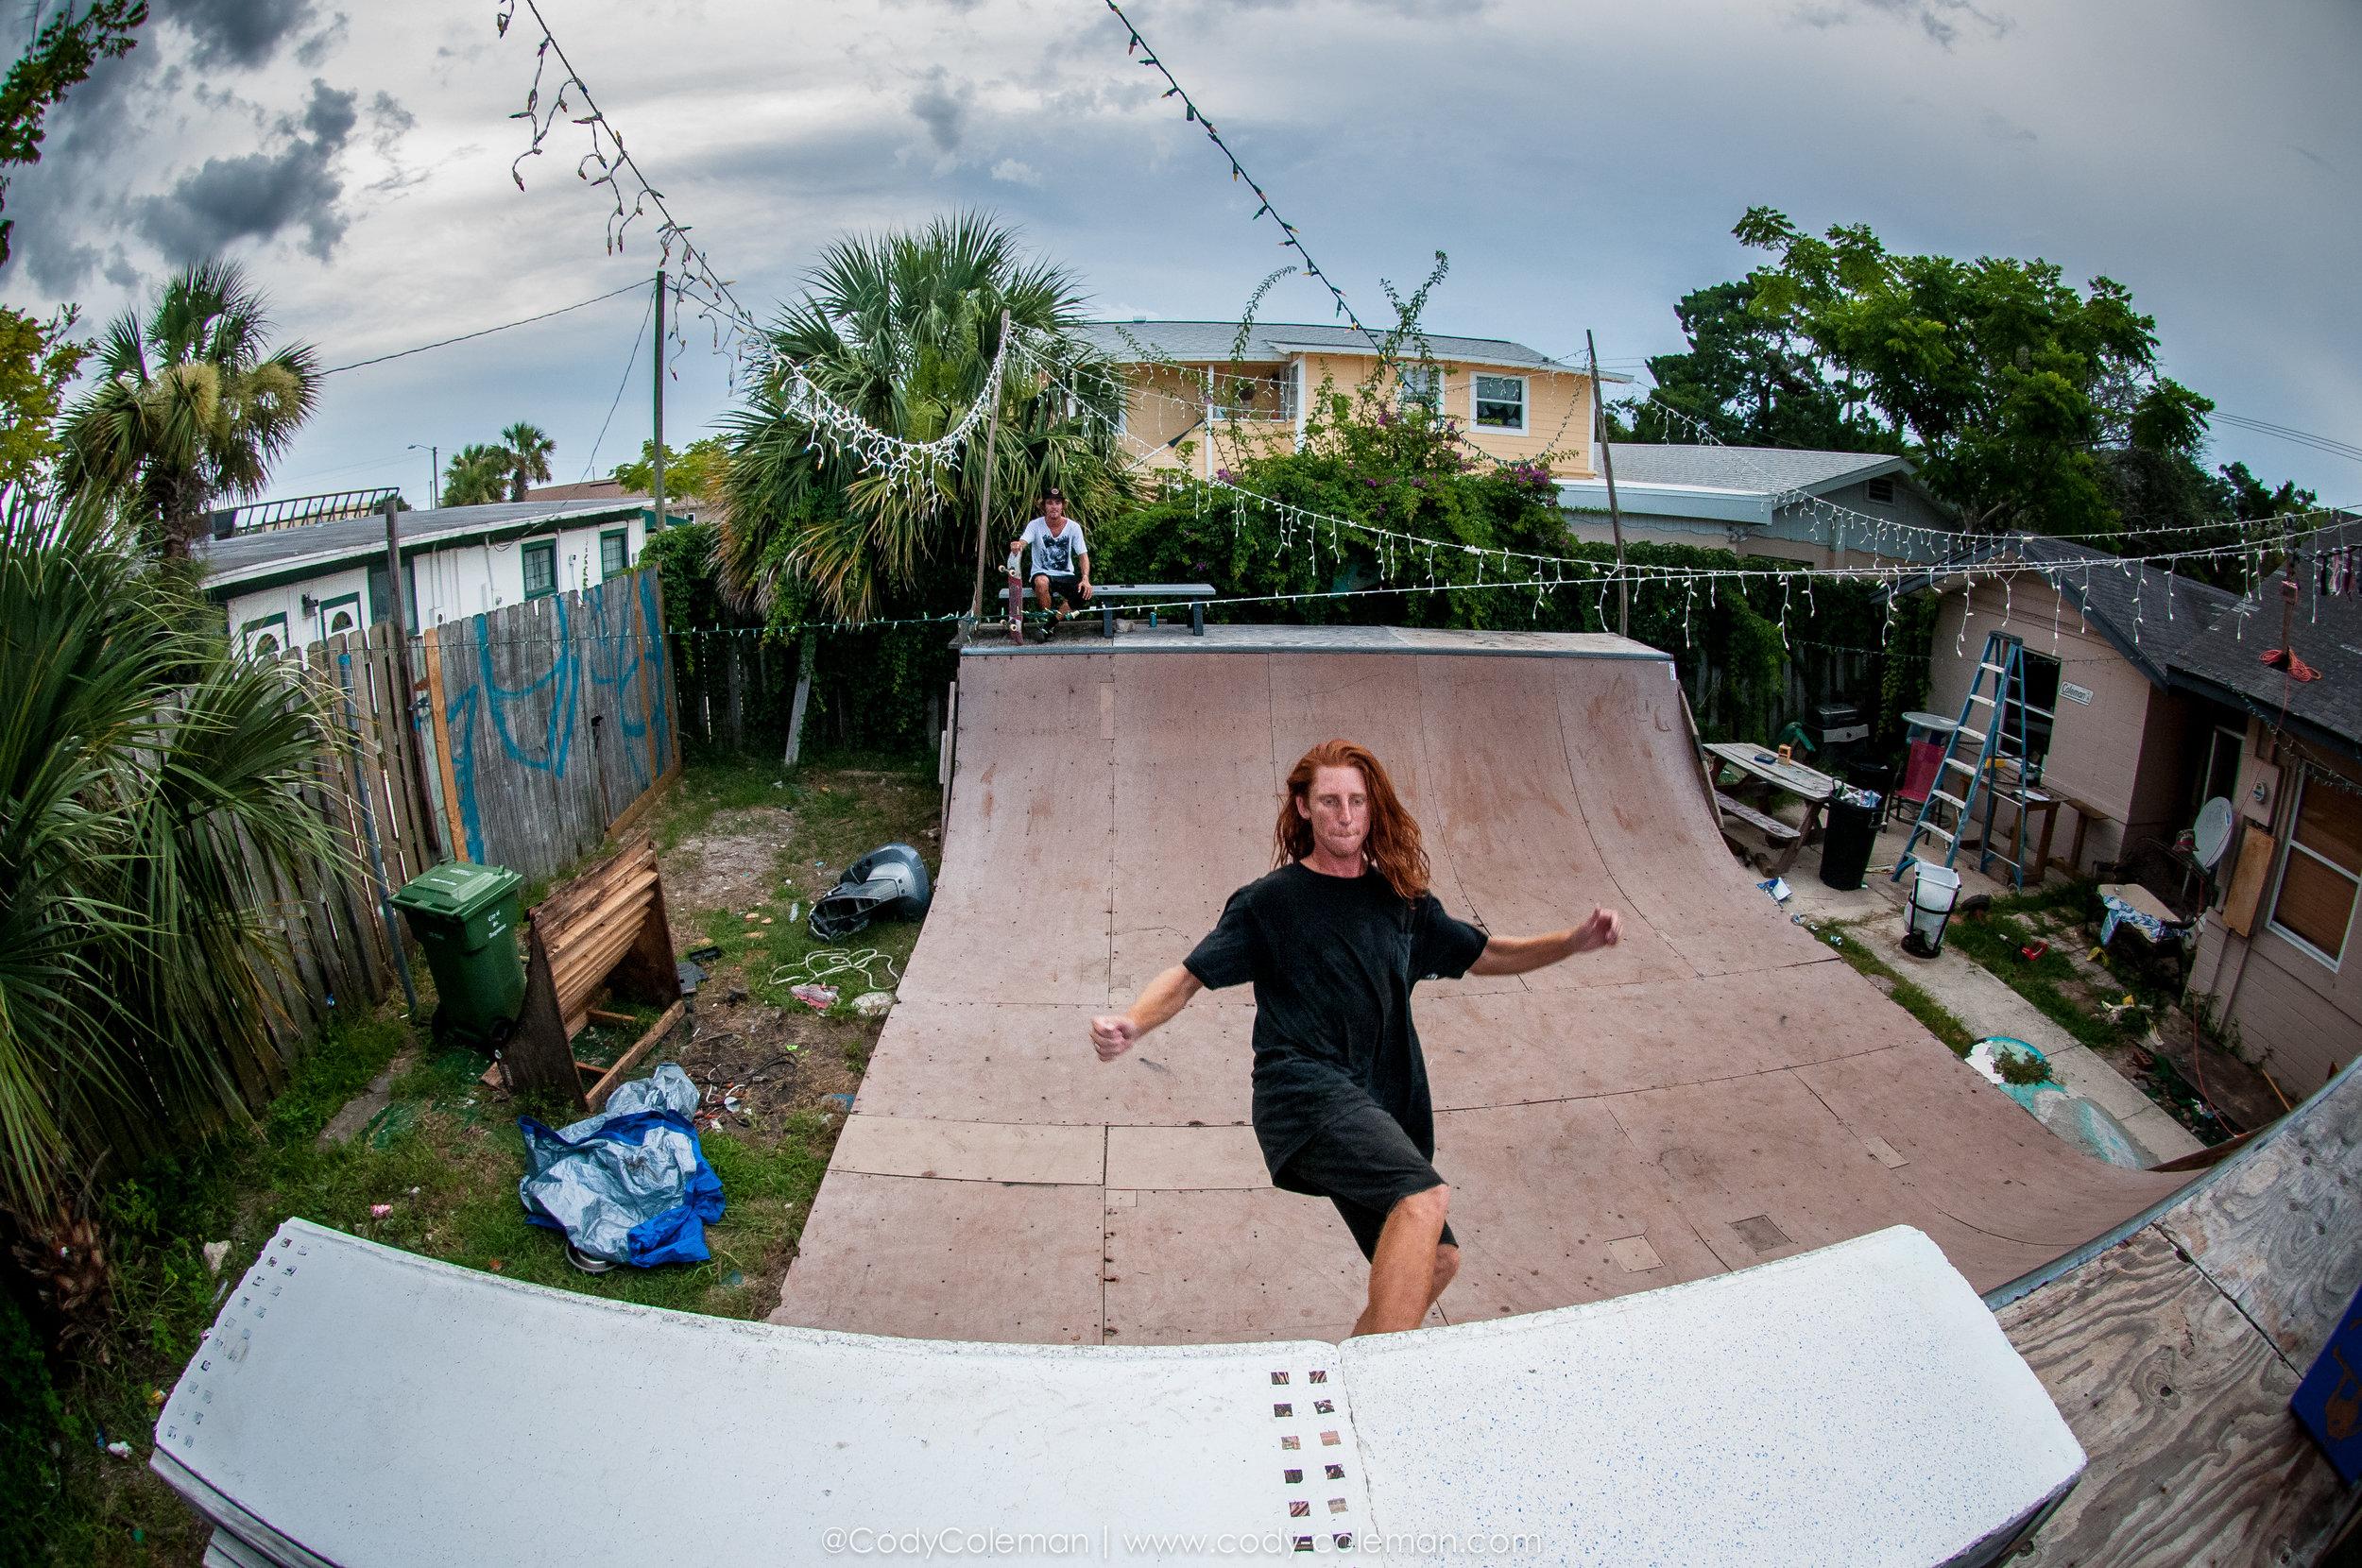 BackyardBozos_Photo_Coleman-17.jpg